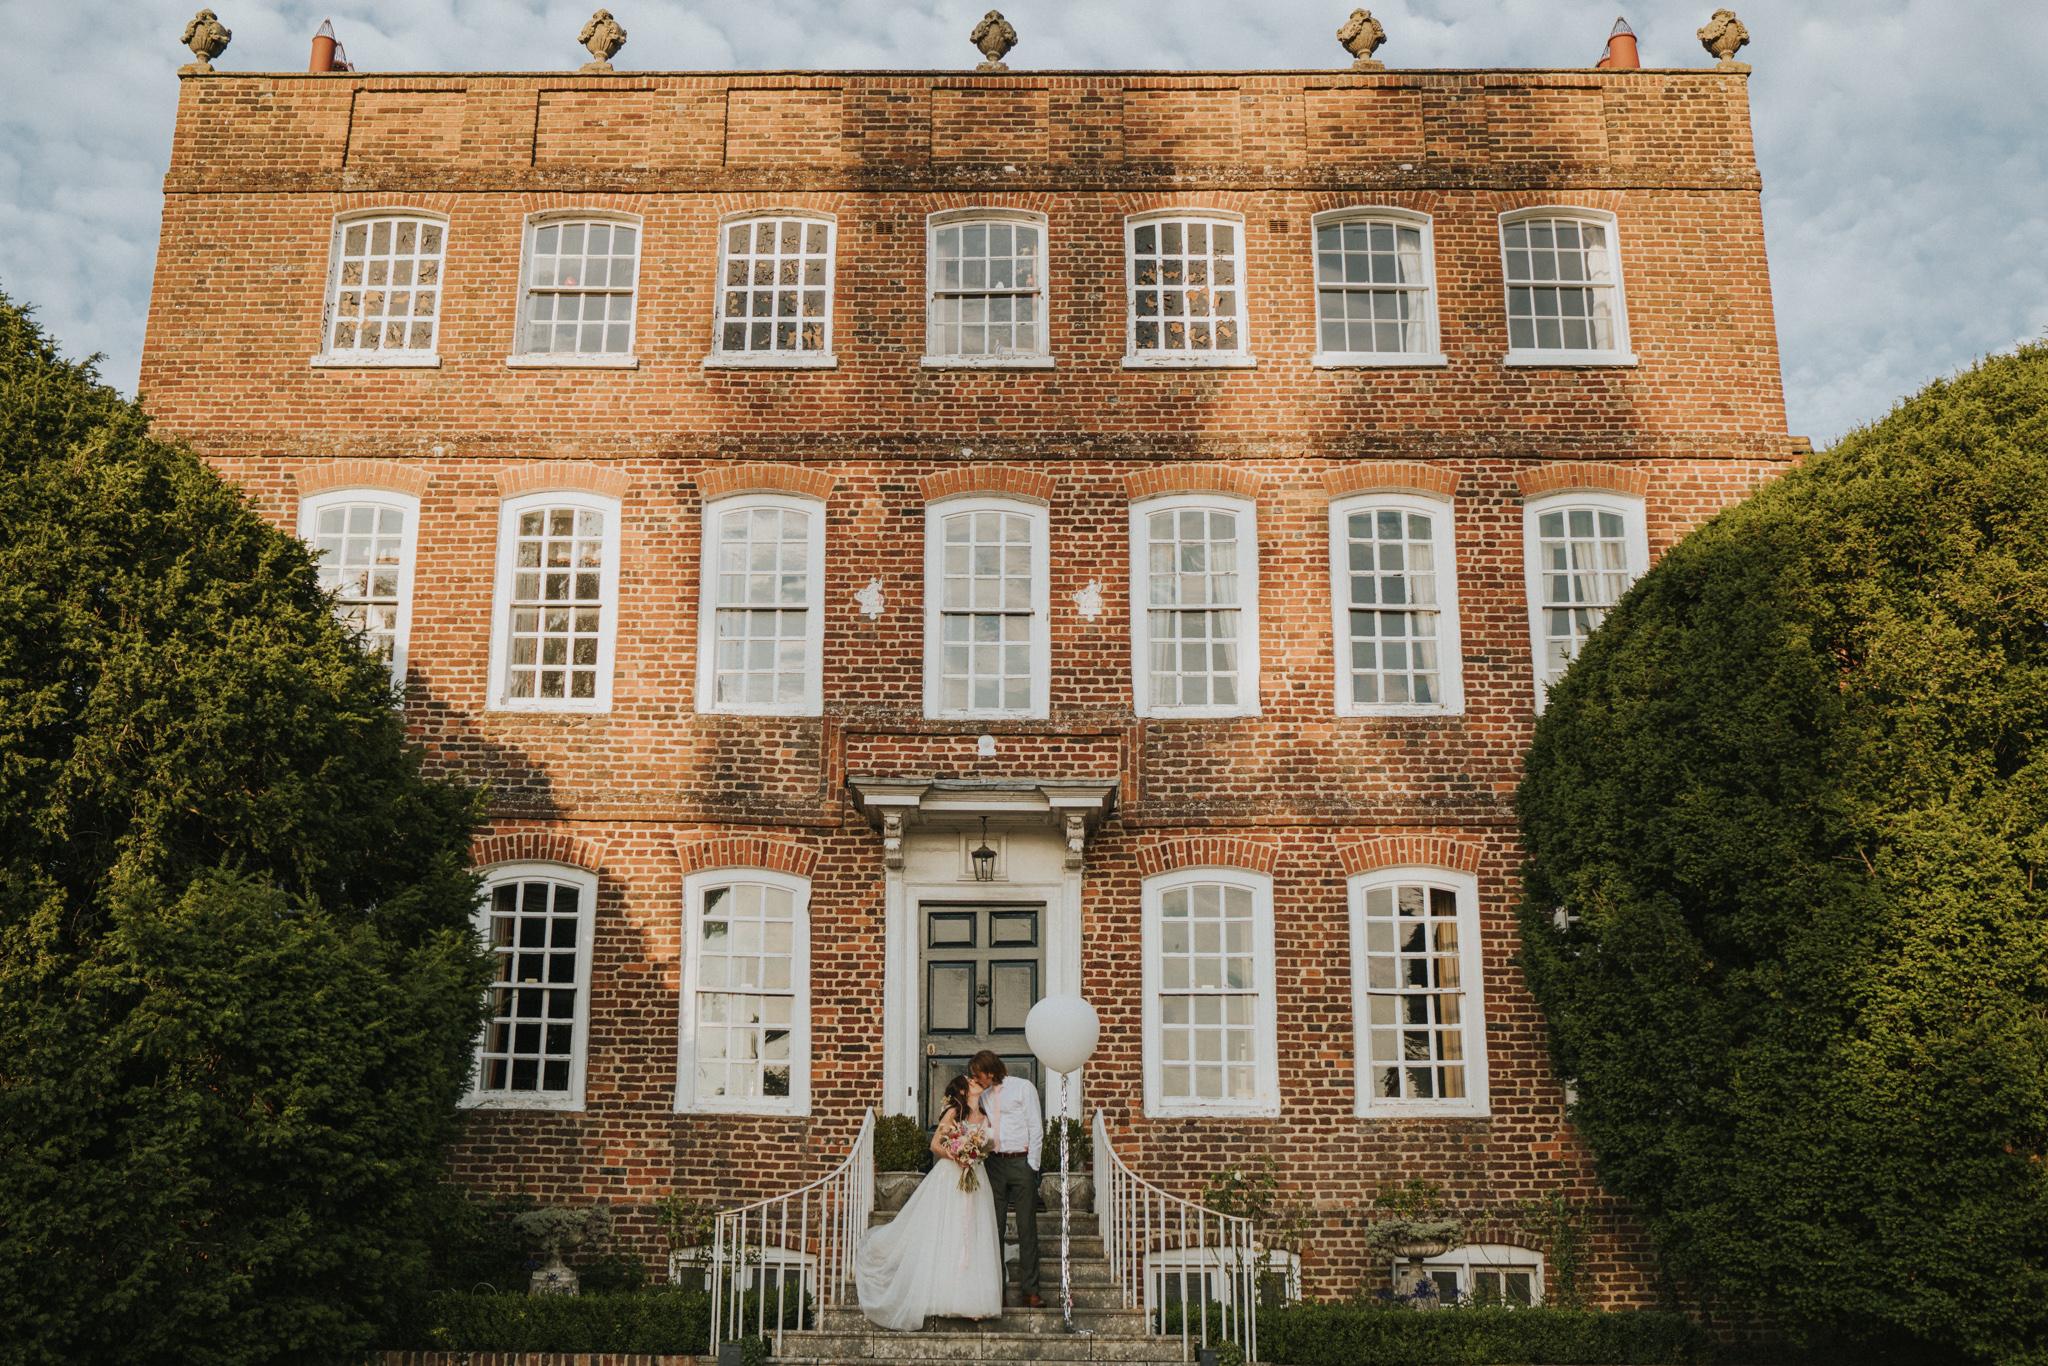 emi-Jack-boho-diy-wedding-eggington-house-grace-elizabeth-colchester-essex-alternative-wedding-photographer-suffolk-norfolk-devon (45 of 56).jpg